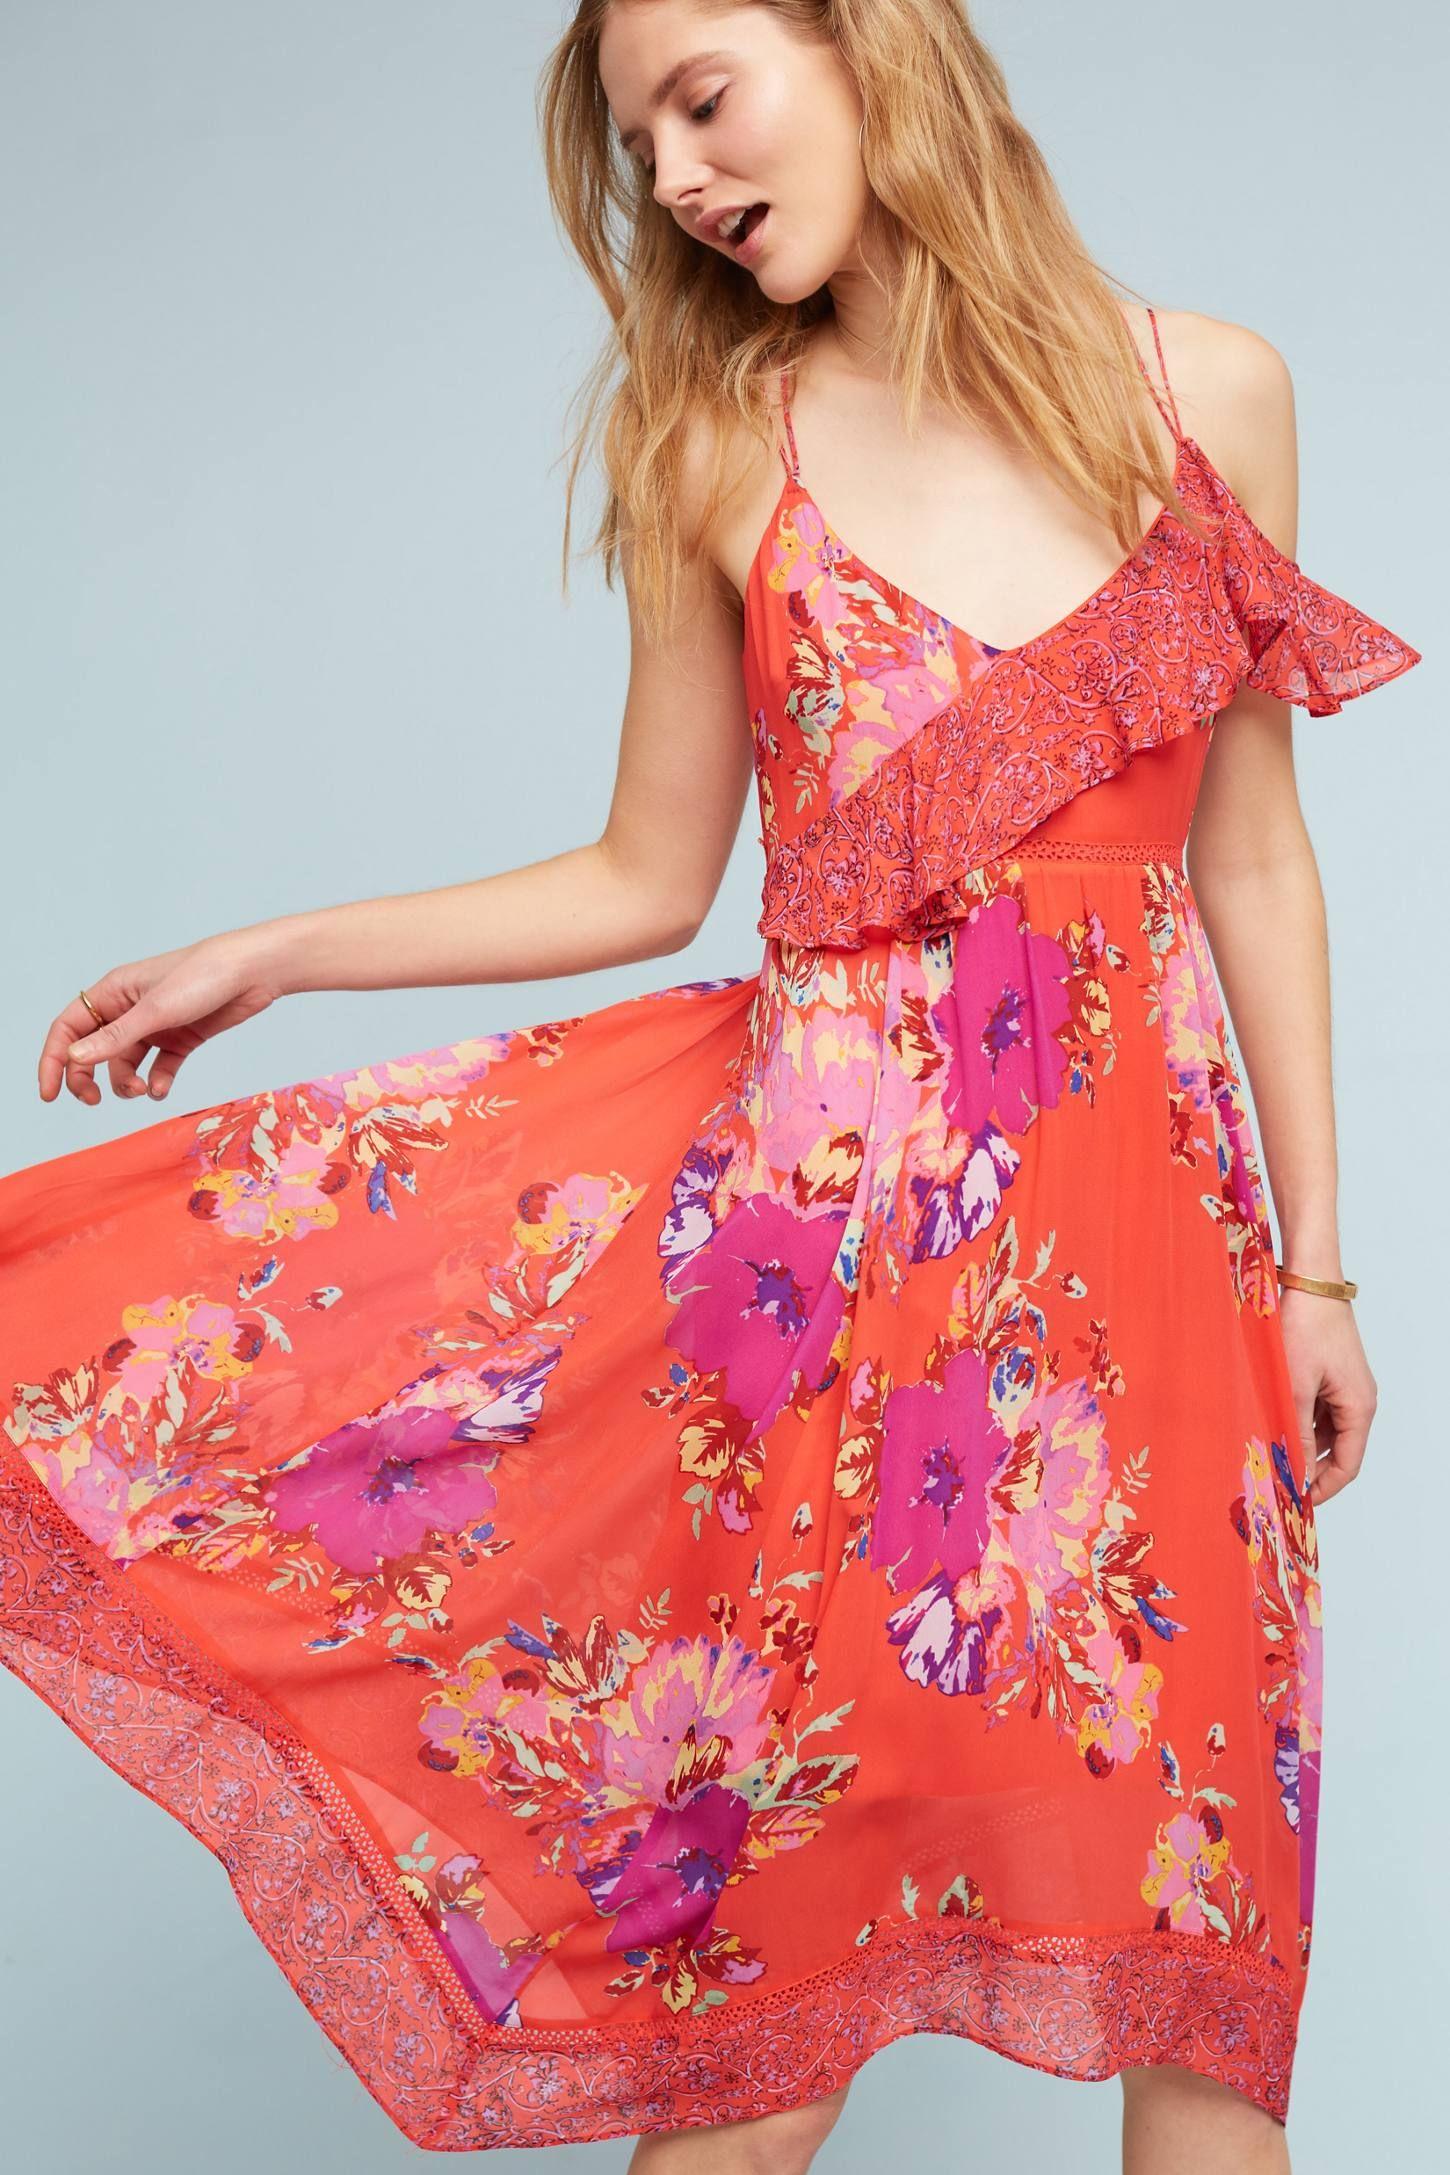 Grecia Ruffle Dress | I\'ll Wear This & That | Pinterest